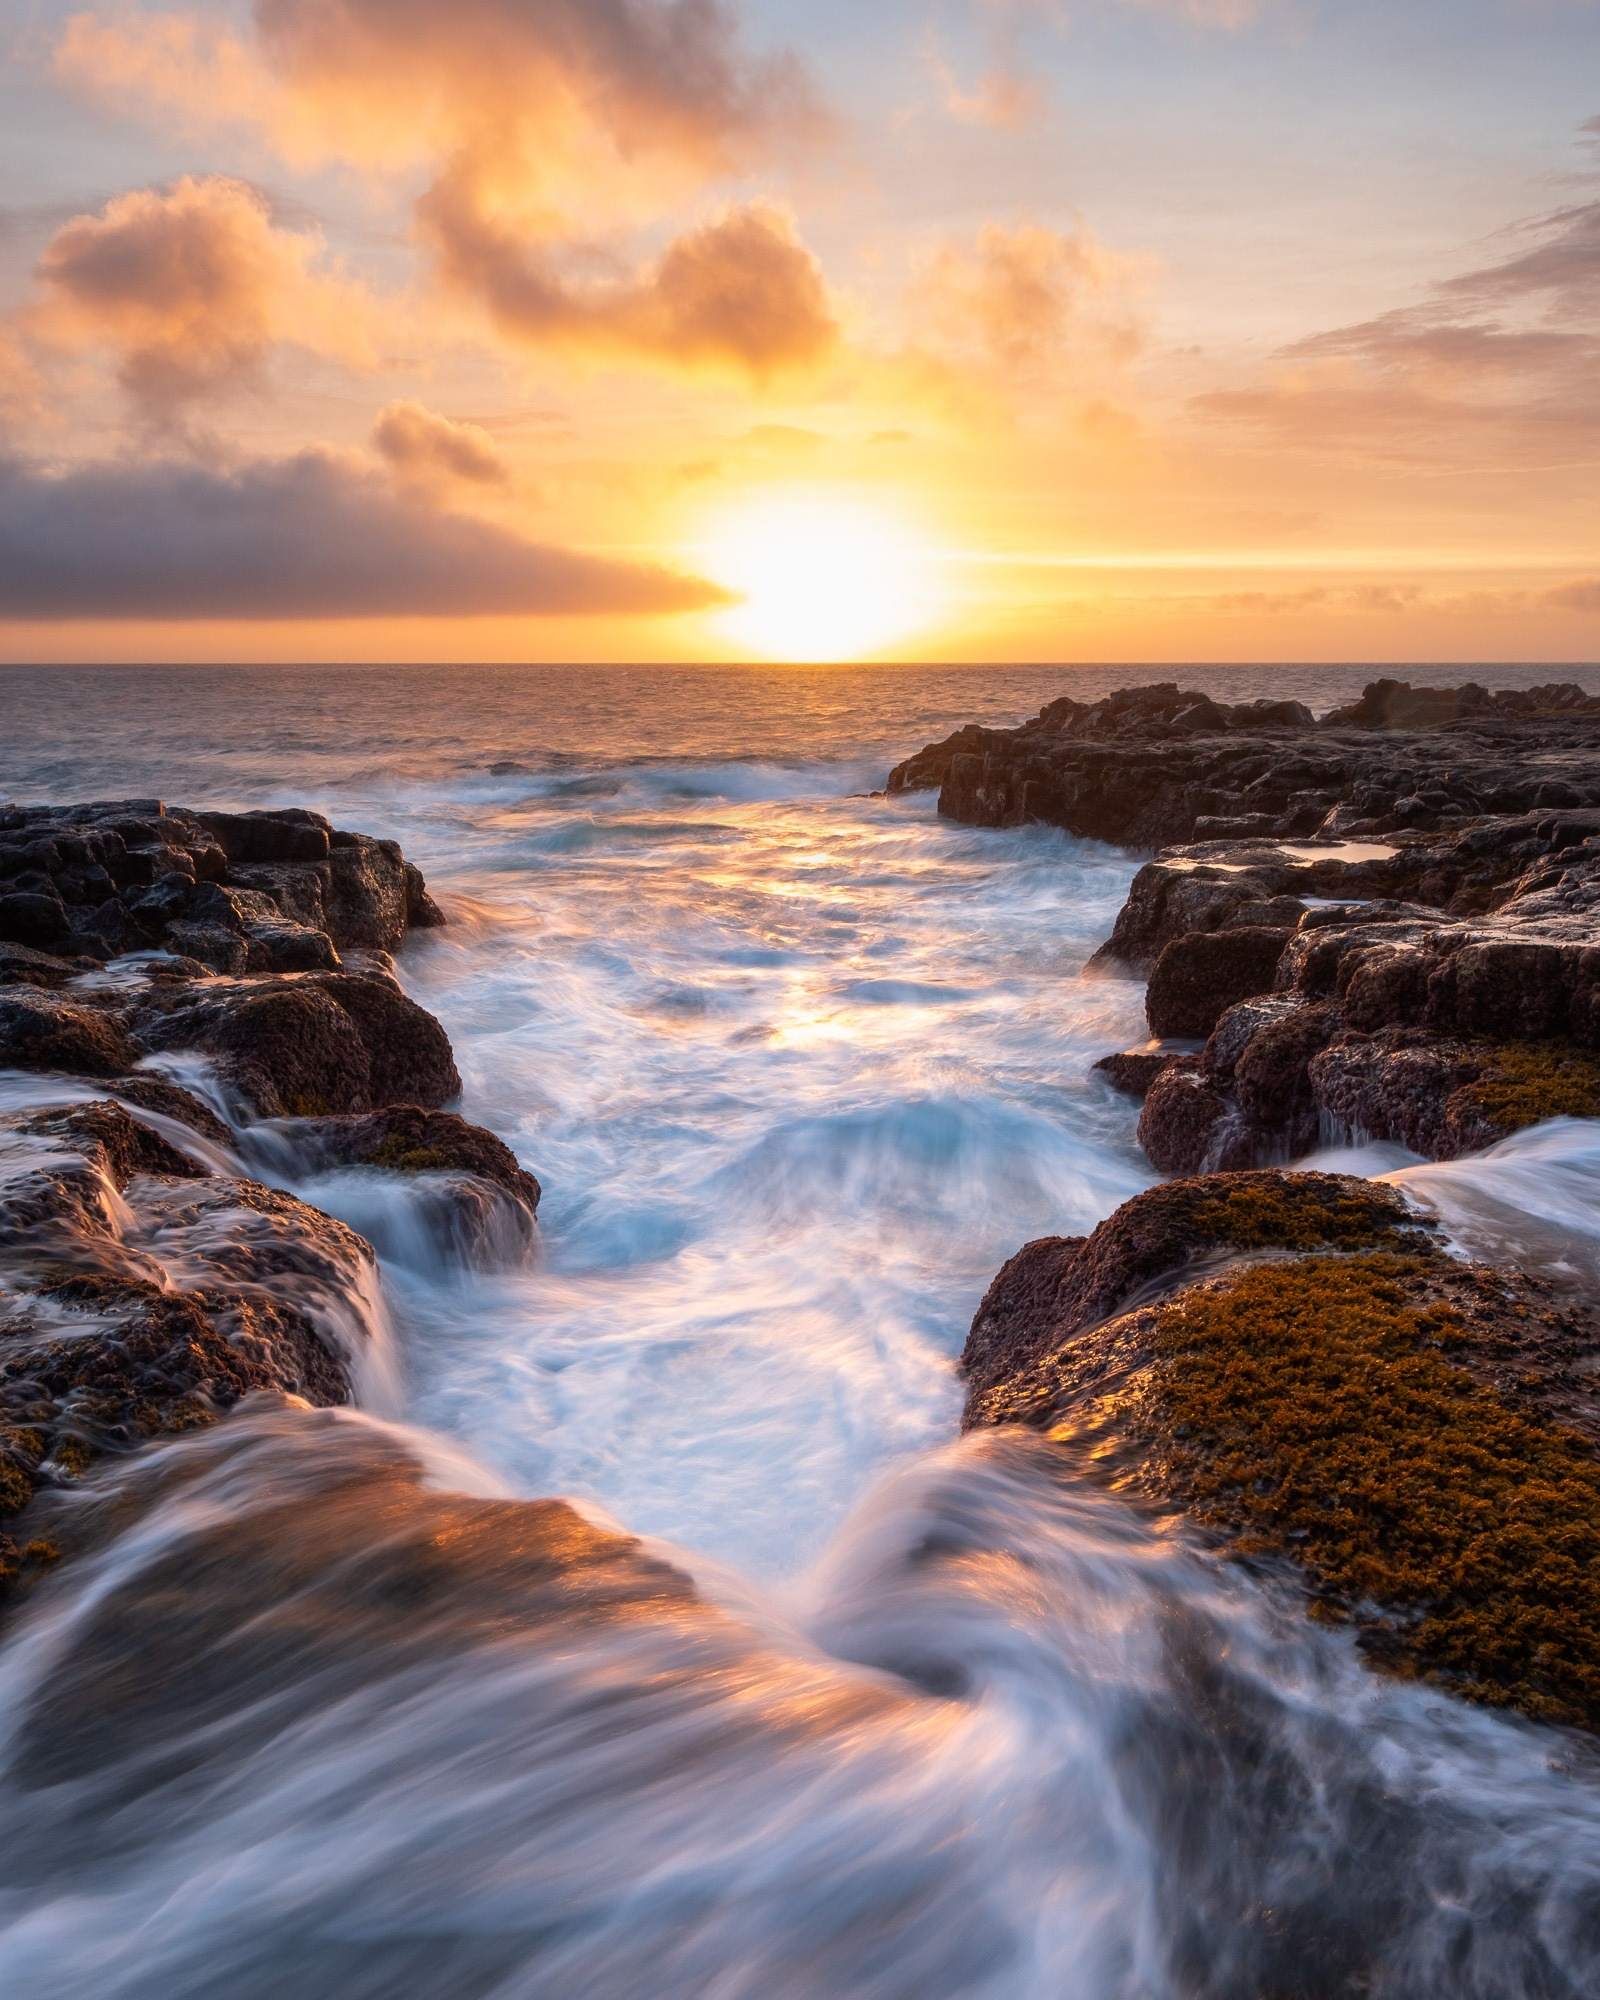 Movement of the Atlantic ocean at the coastline of Porto Martins, Terceira Island, Azores